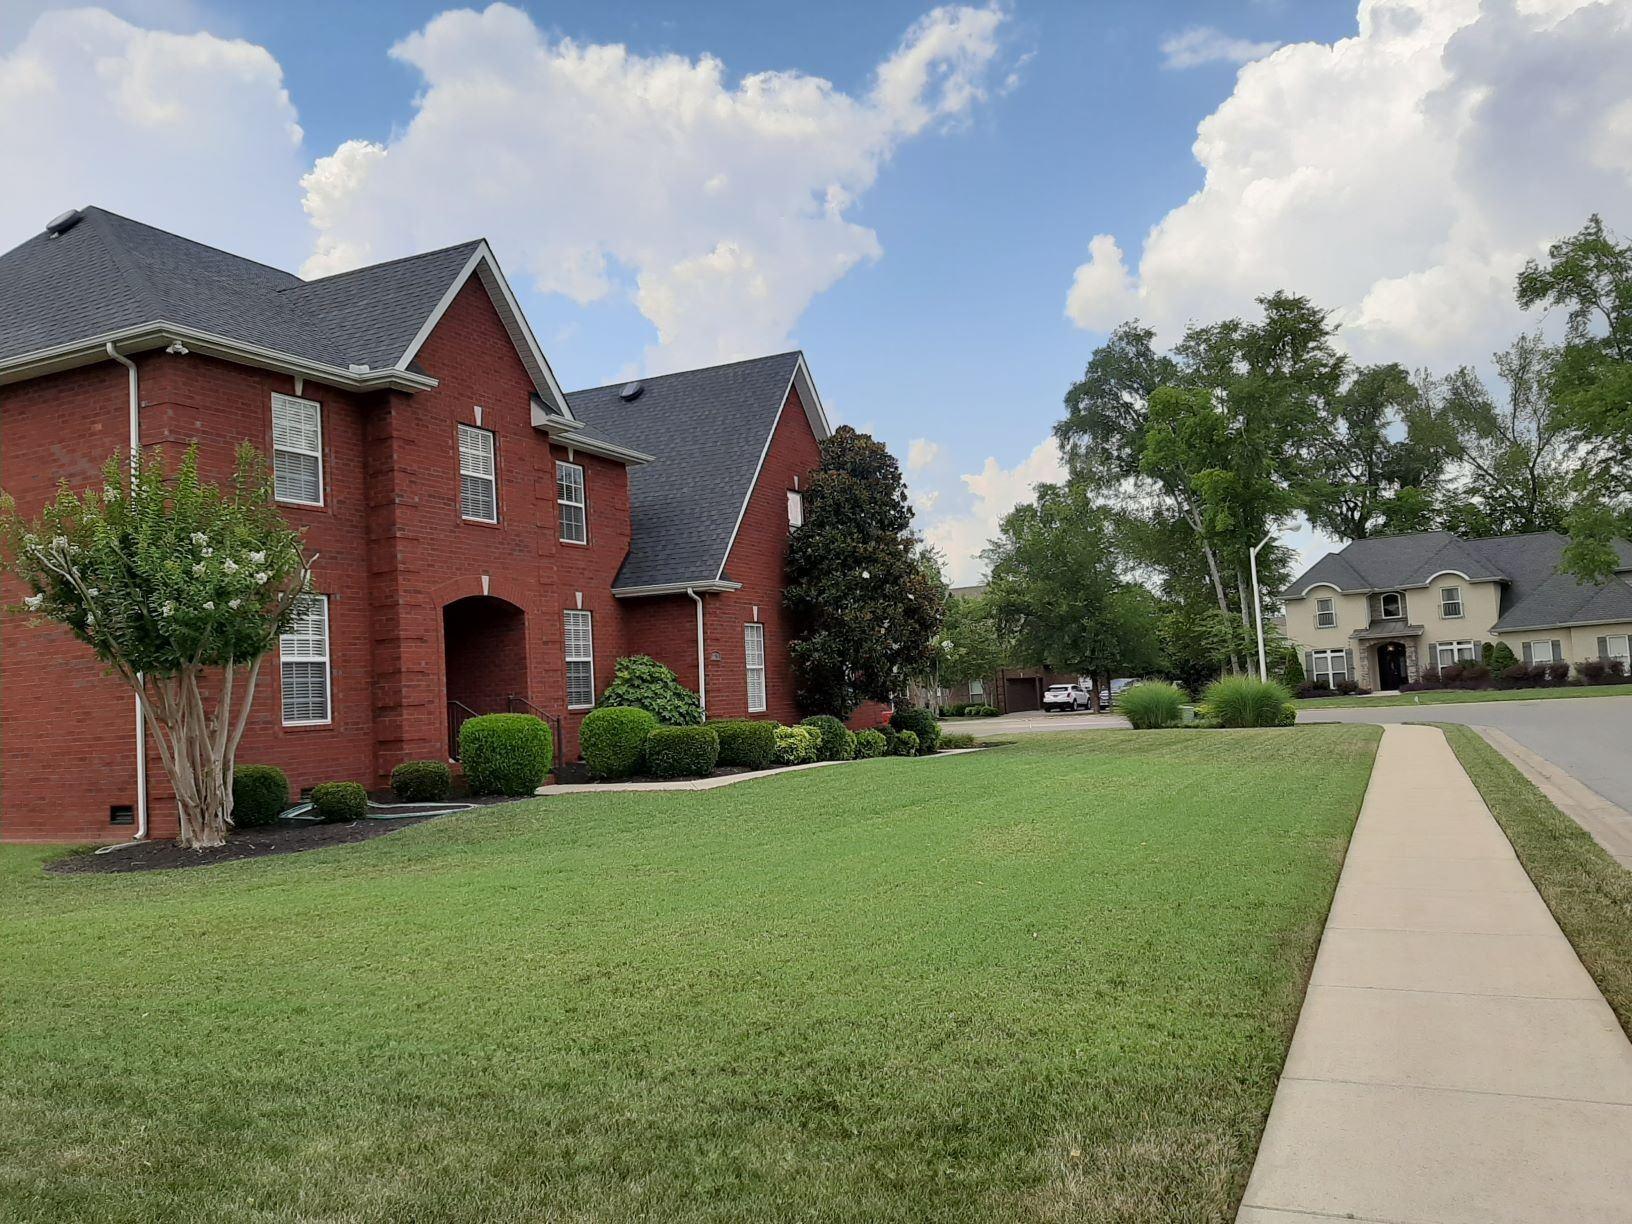 Photo of 2210 Kadyday Way, Murfreesboro, TN 37128 (MLS # 2139214)